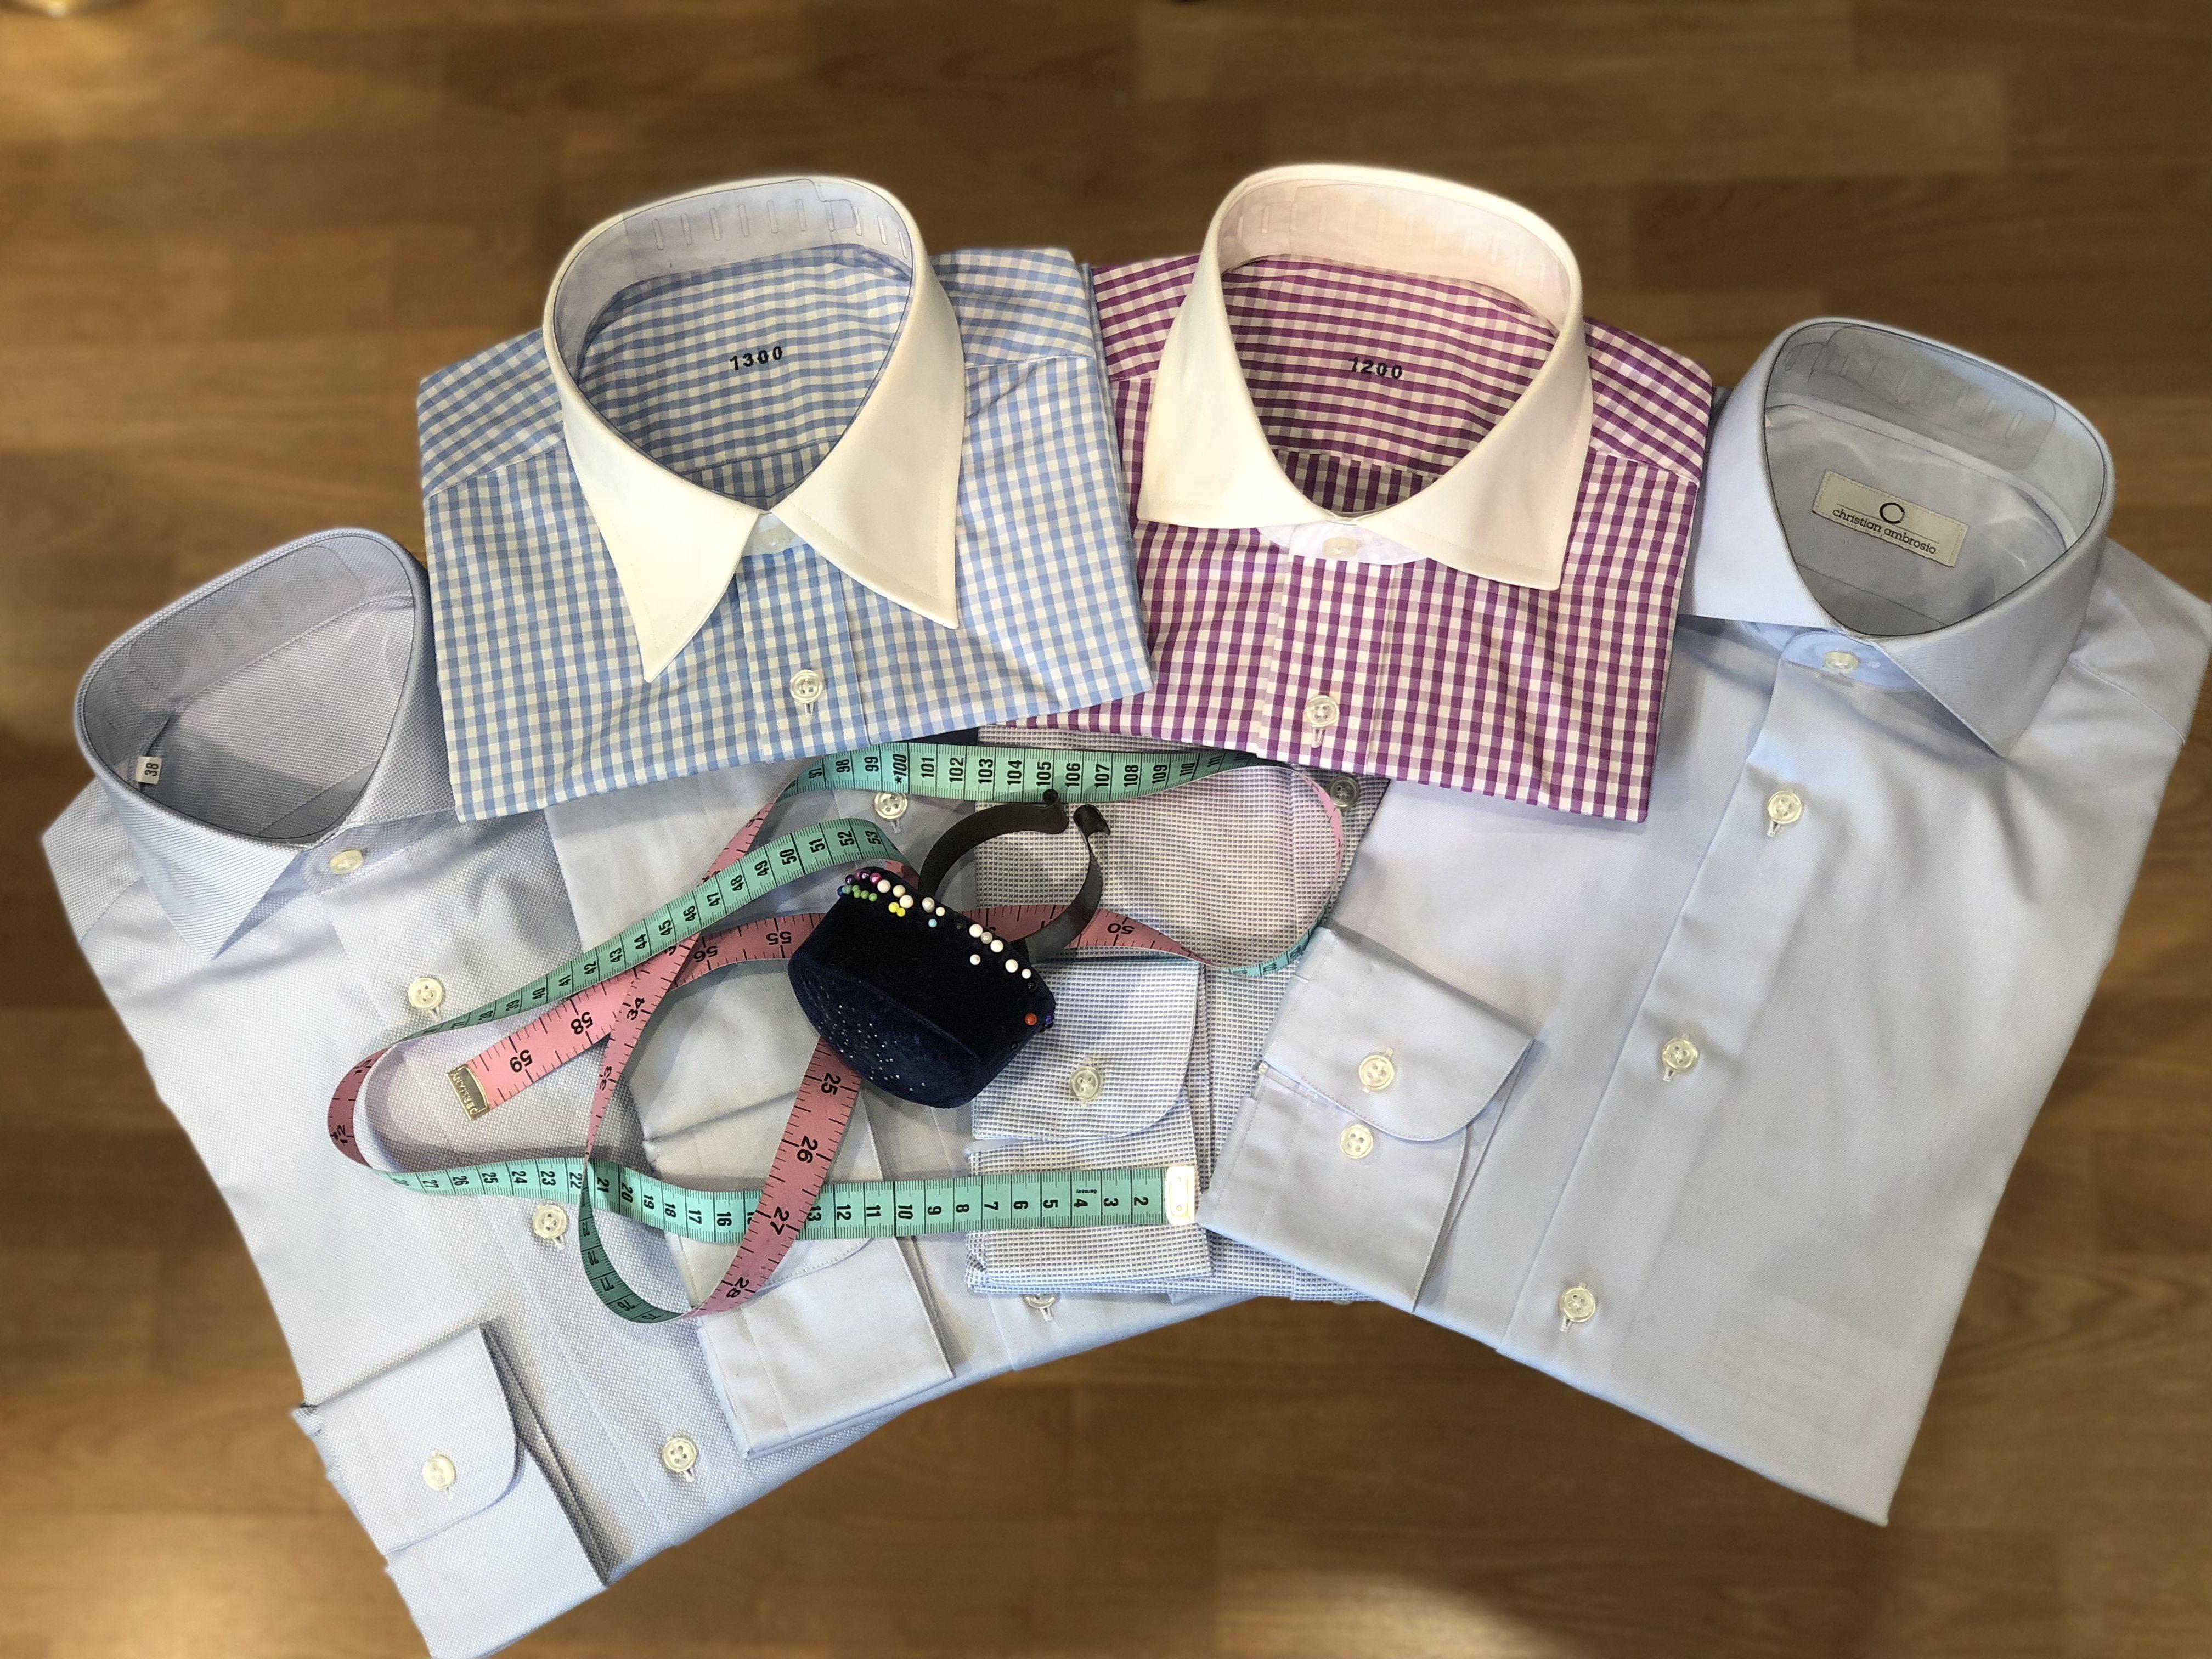 Chemises 5 - Christian Ambrosio